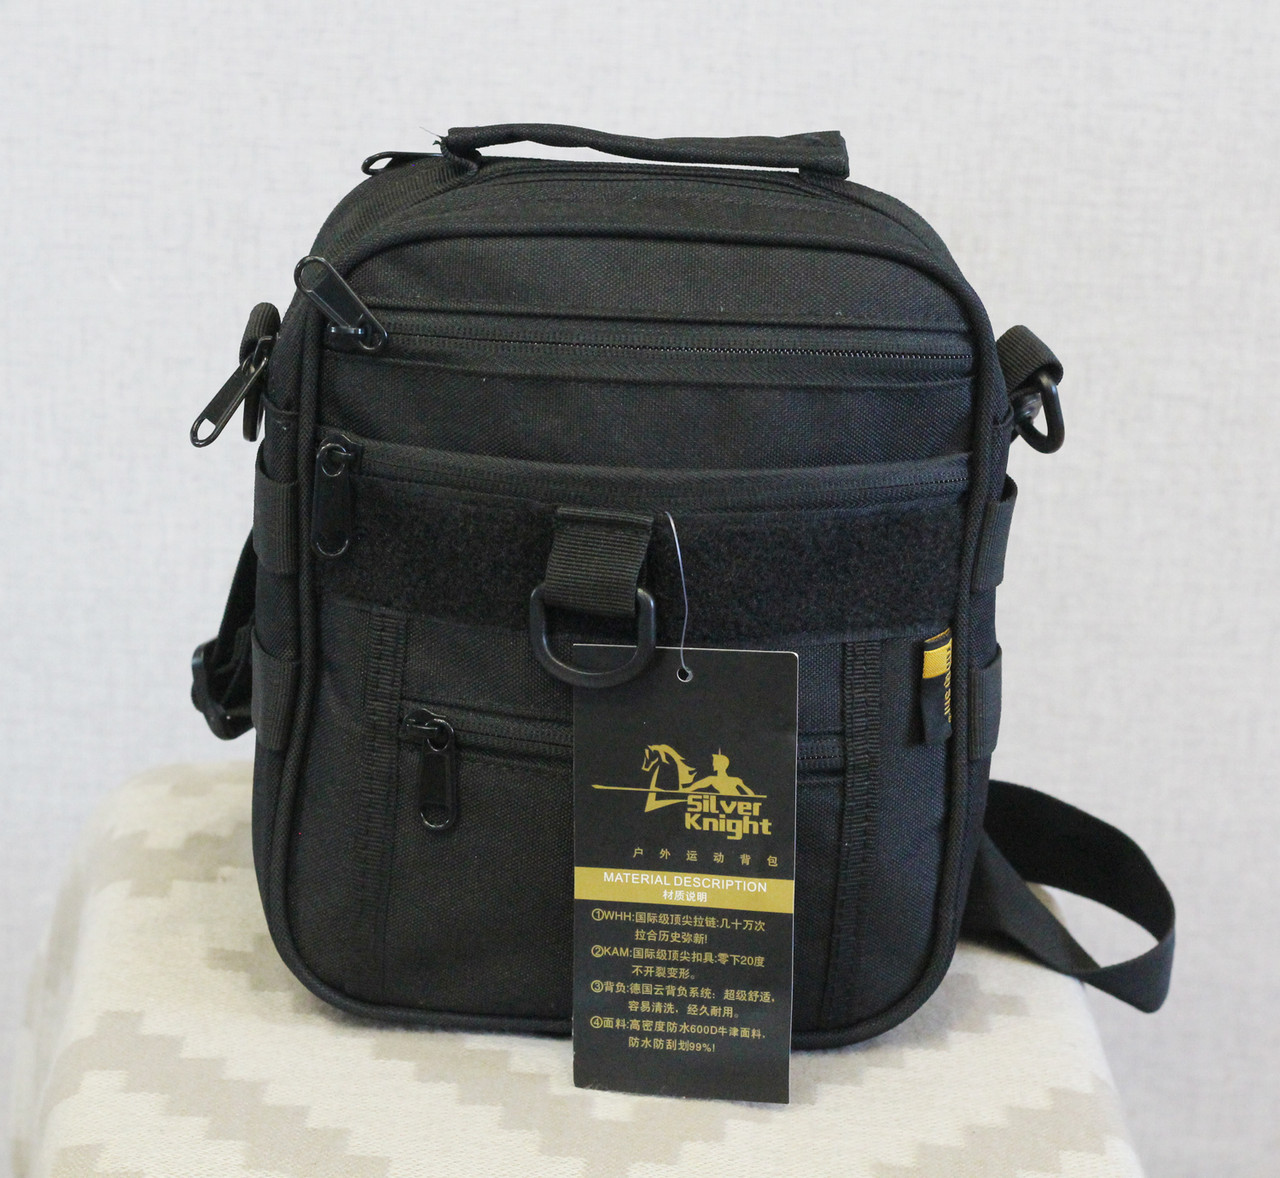 Тактична універсальна сумка на плече Silver Knight з системою M. O. L. L. E (102-black)